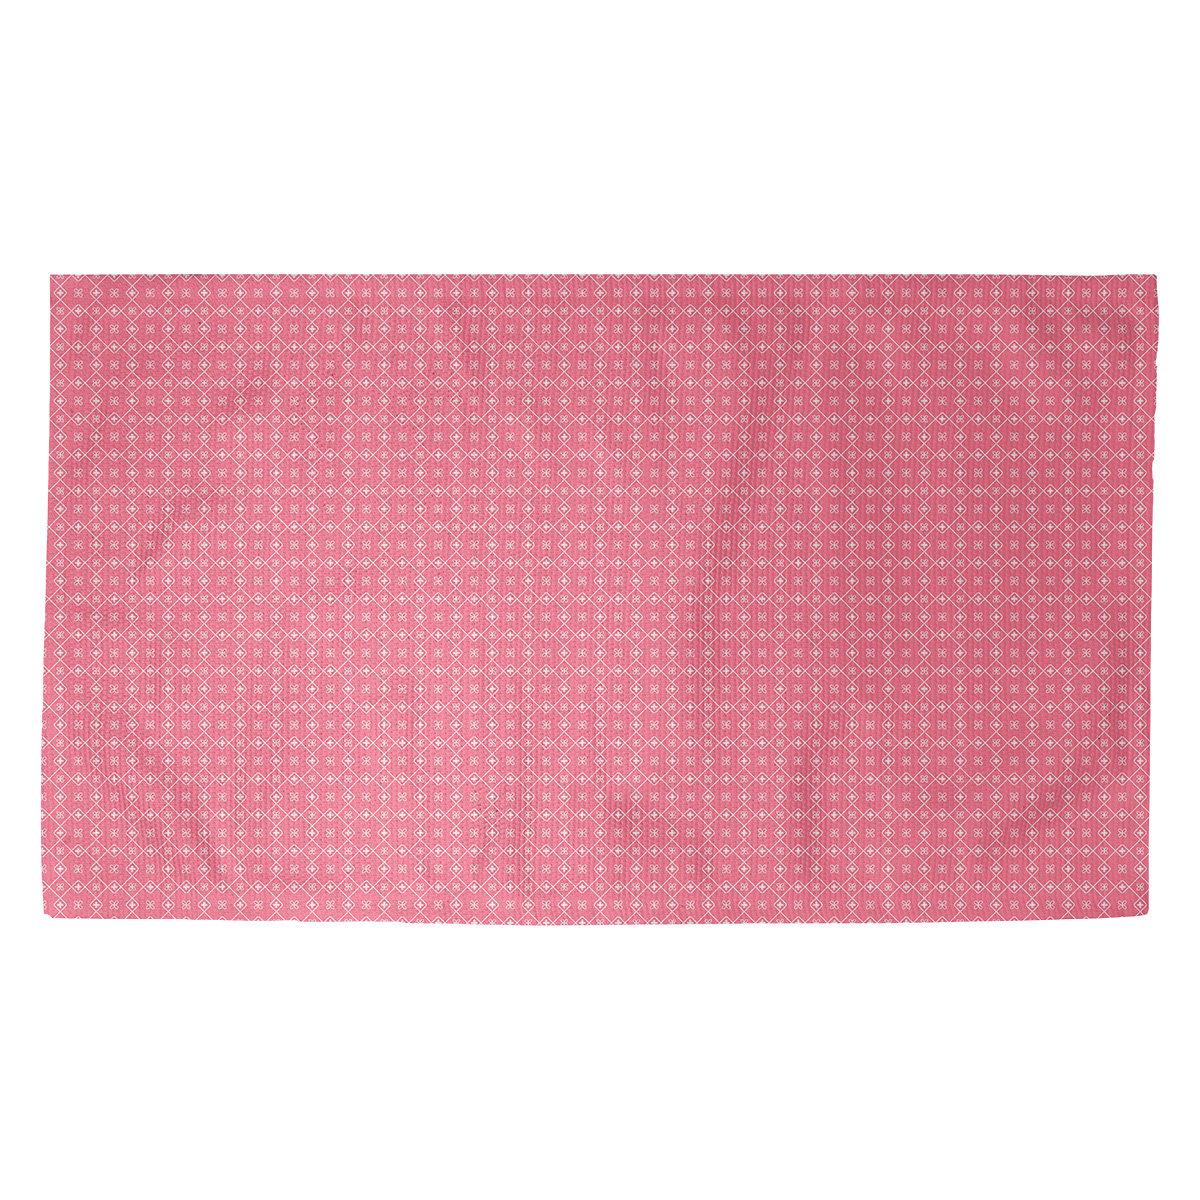 Latitude Run Avicia Doily Pink Area Rug Wayfair